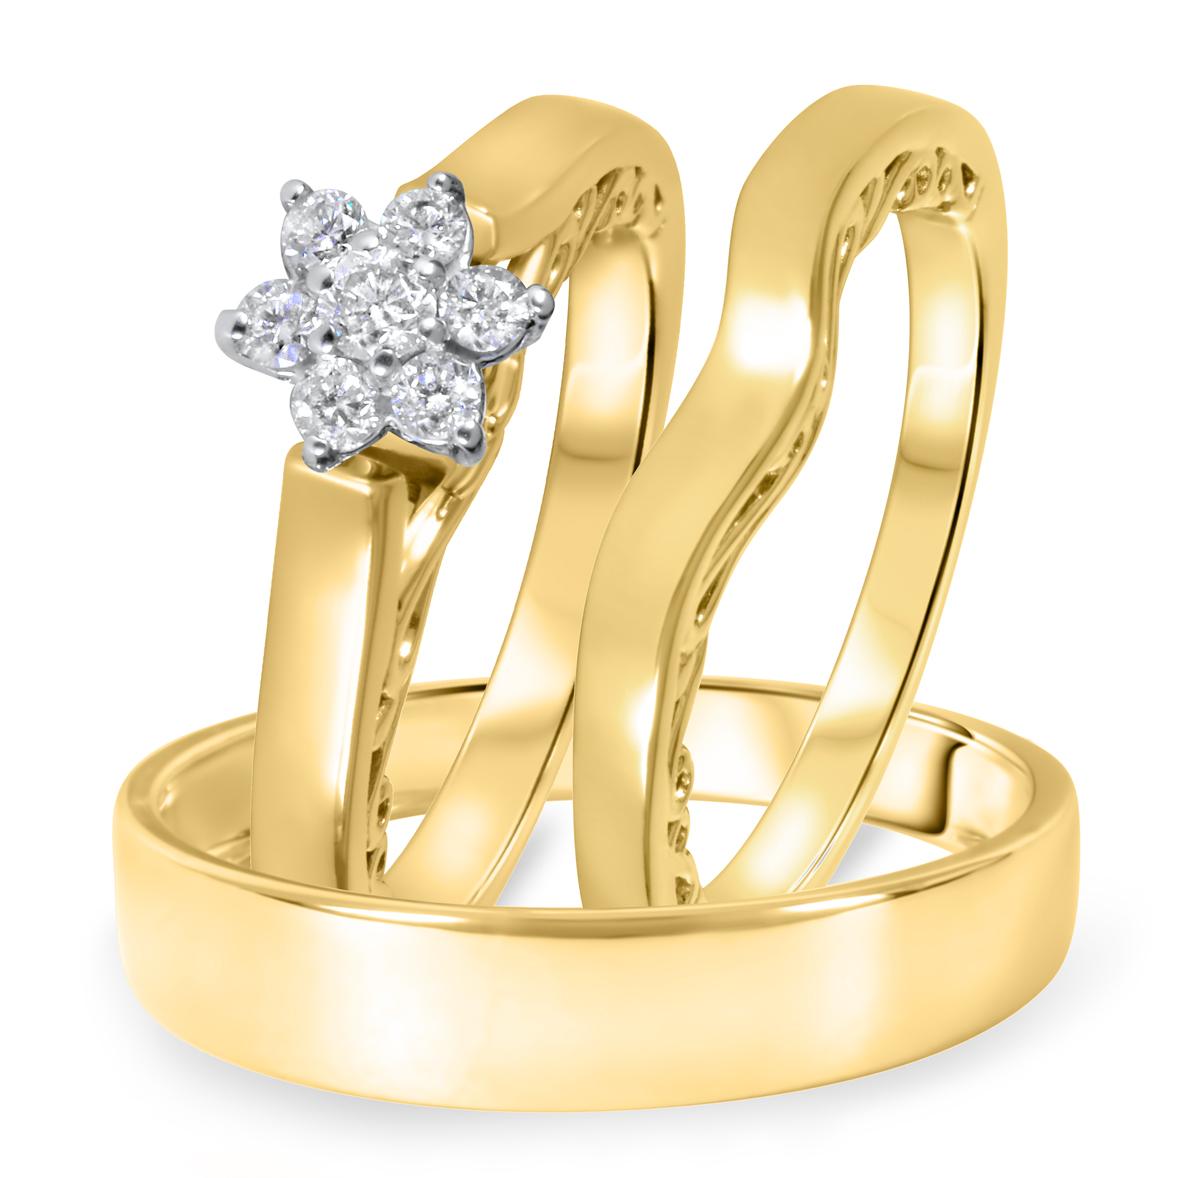 1/4 CT. T.W. Diamond Ladies Engagement Ring, Wedding Band, Men's Wedding Band